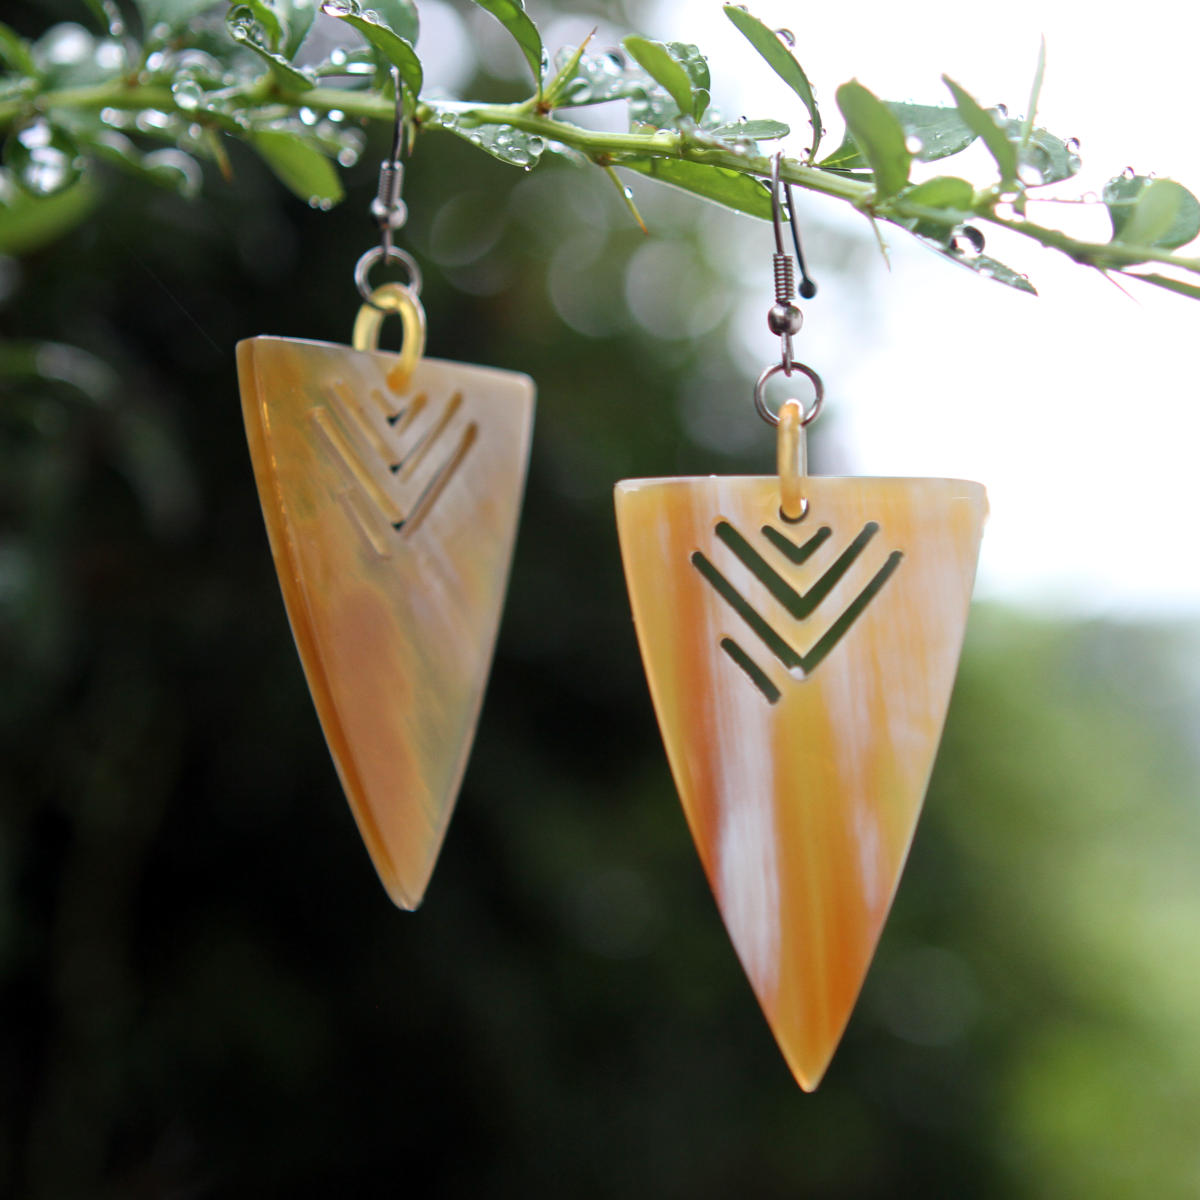 Ethnic earrings, handmade from natural horn, fair trade horn jewelry